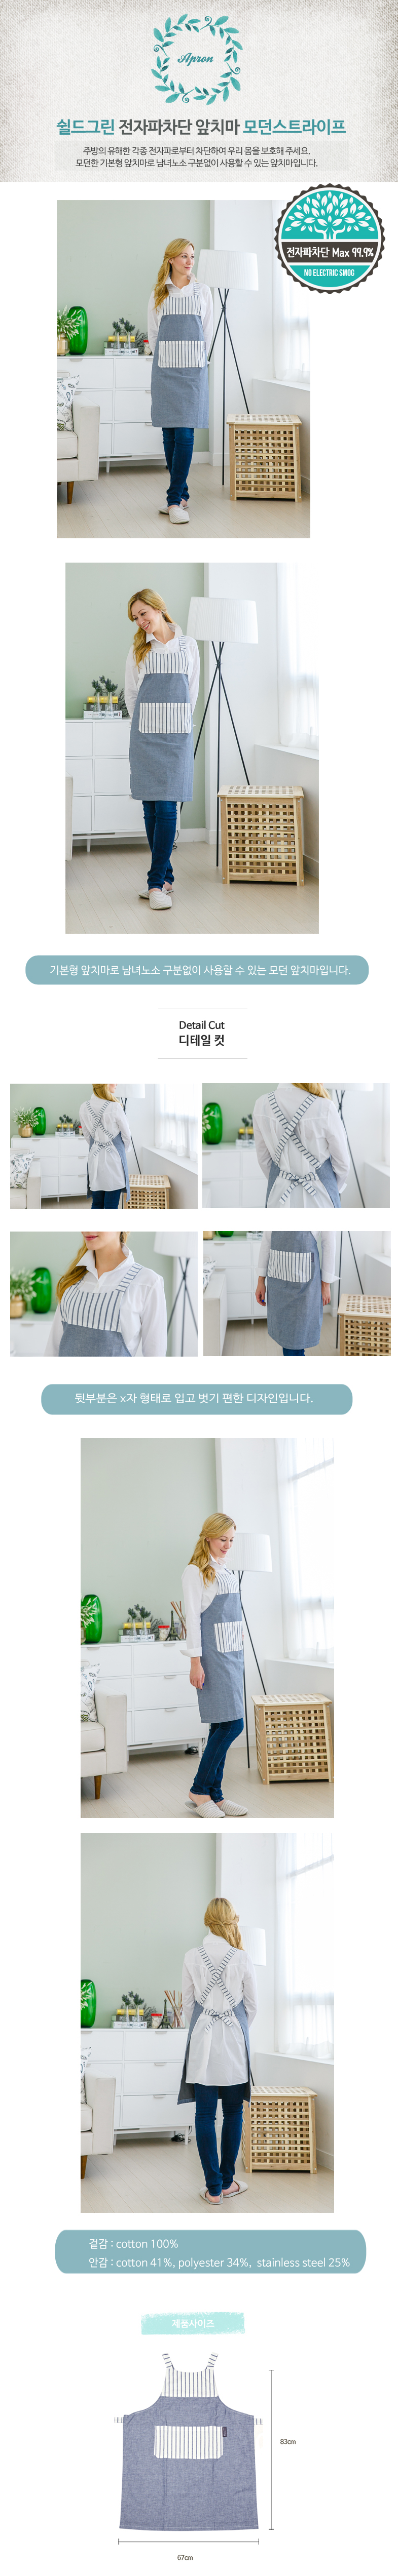 [ ShieldGreen ] Shieldgreen反辐射EMF屏蔽围裙现代条纹